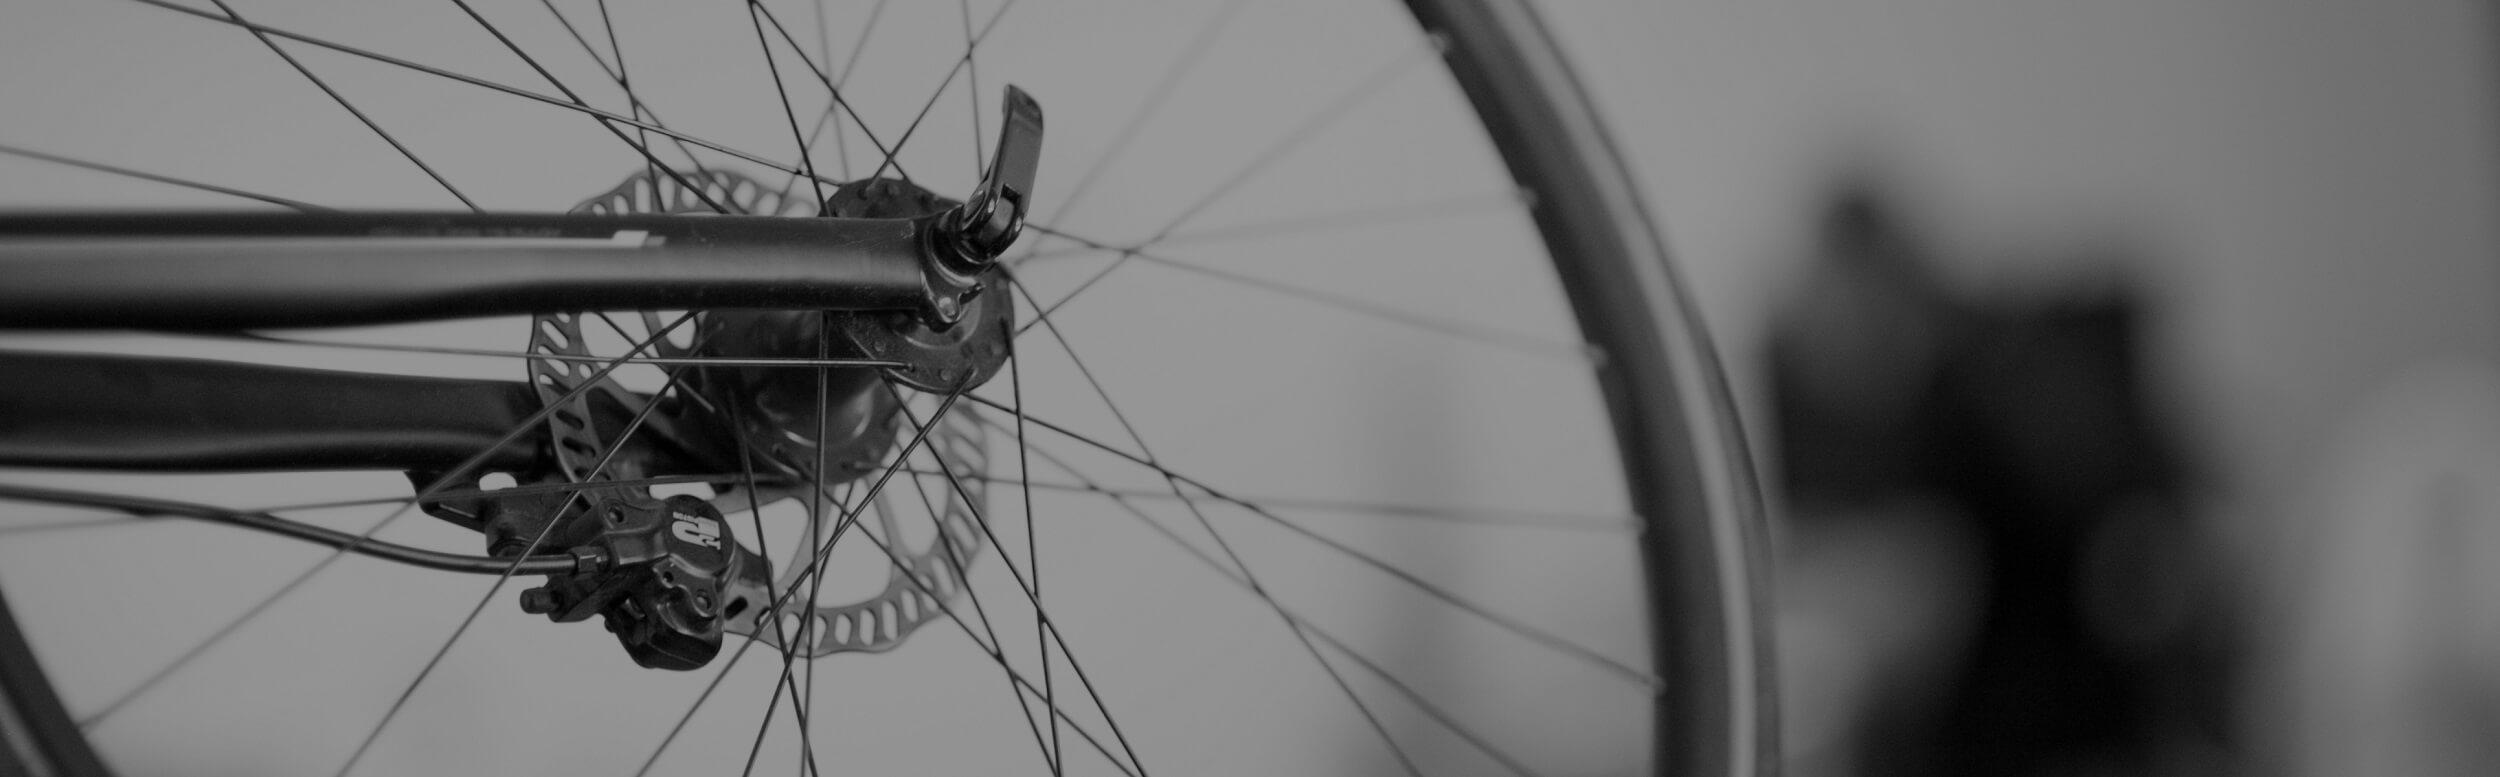 Koleso bicykla